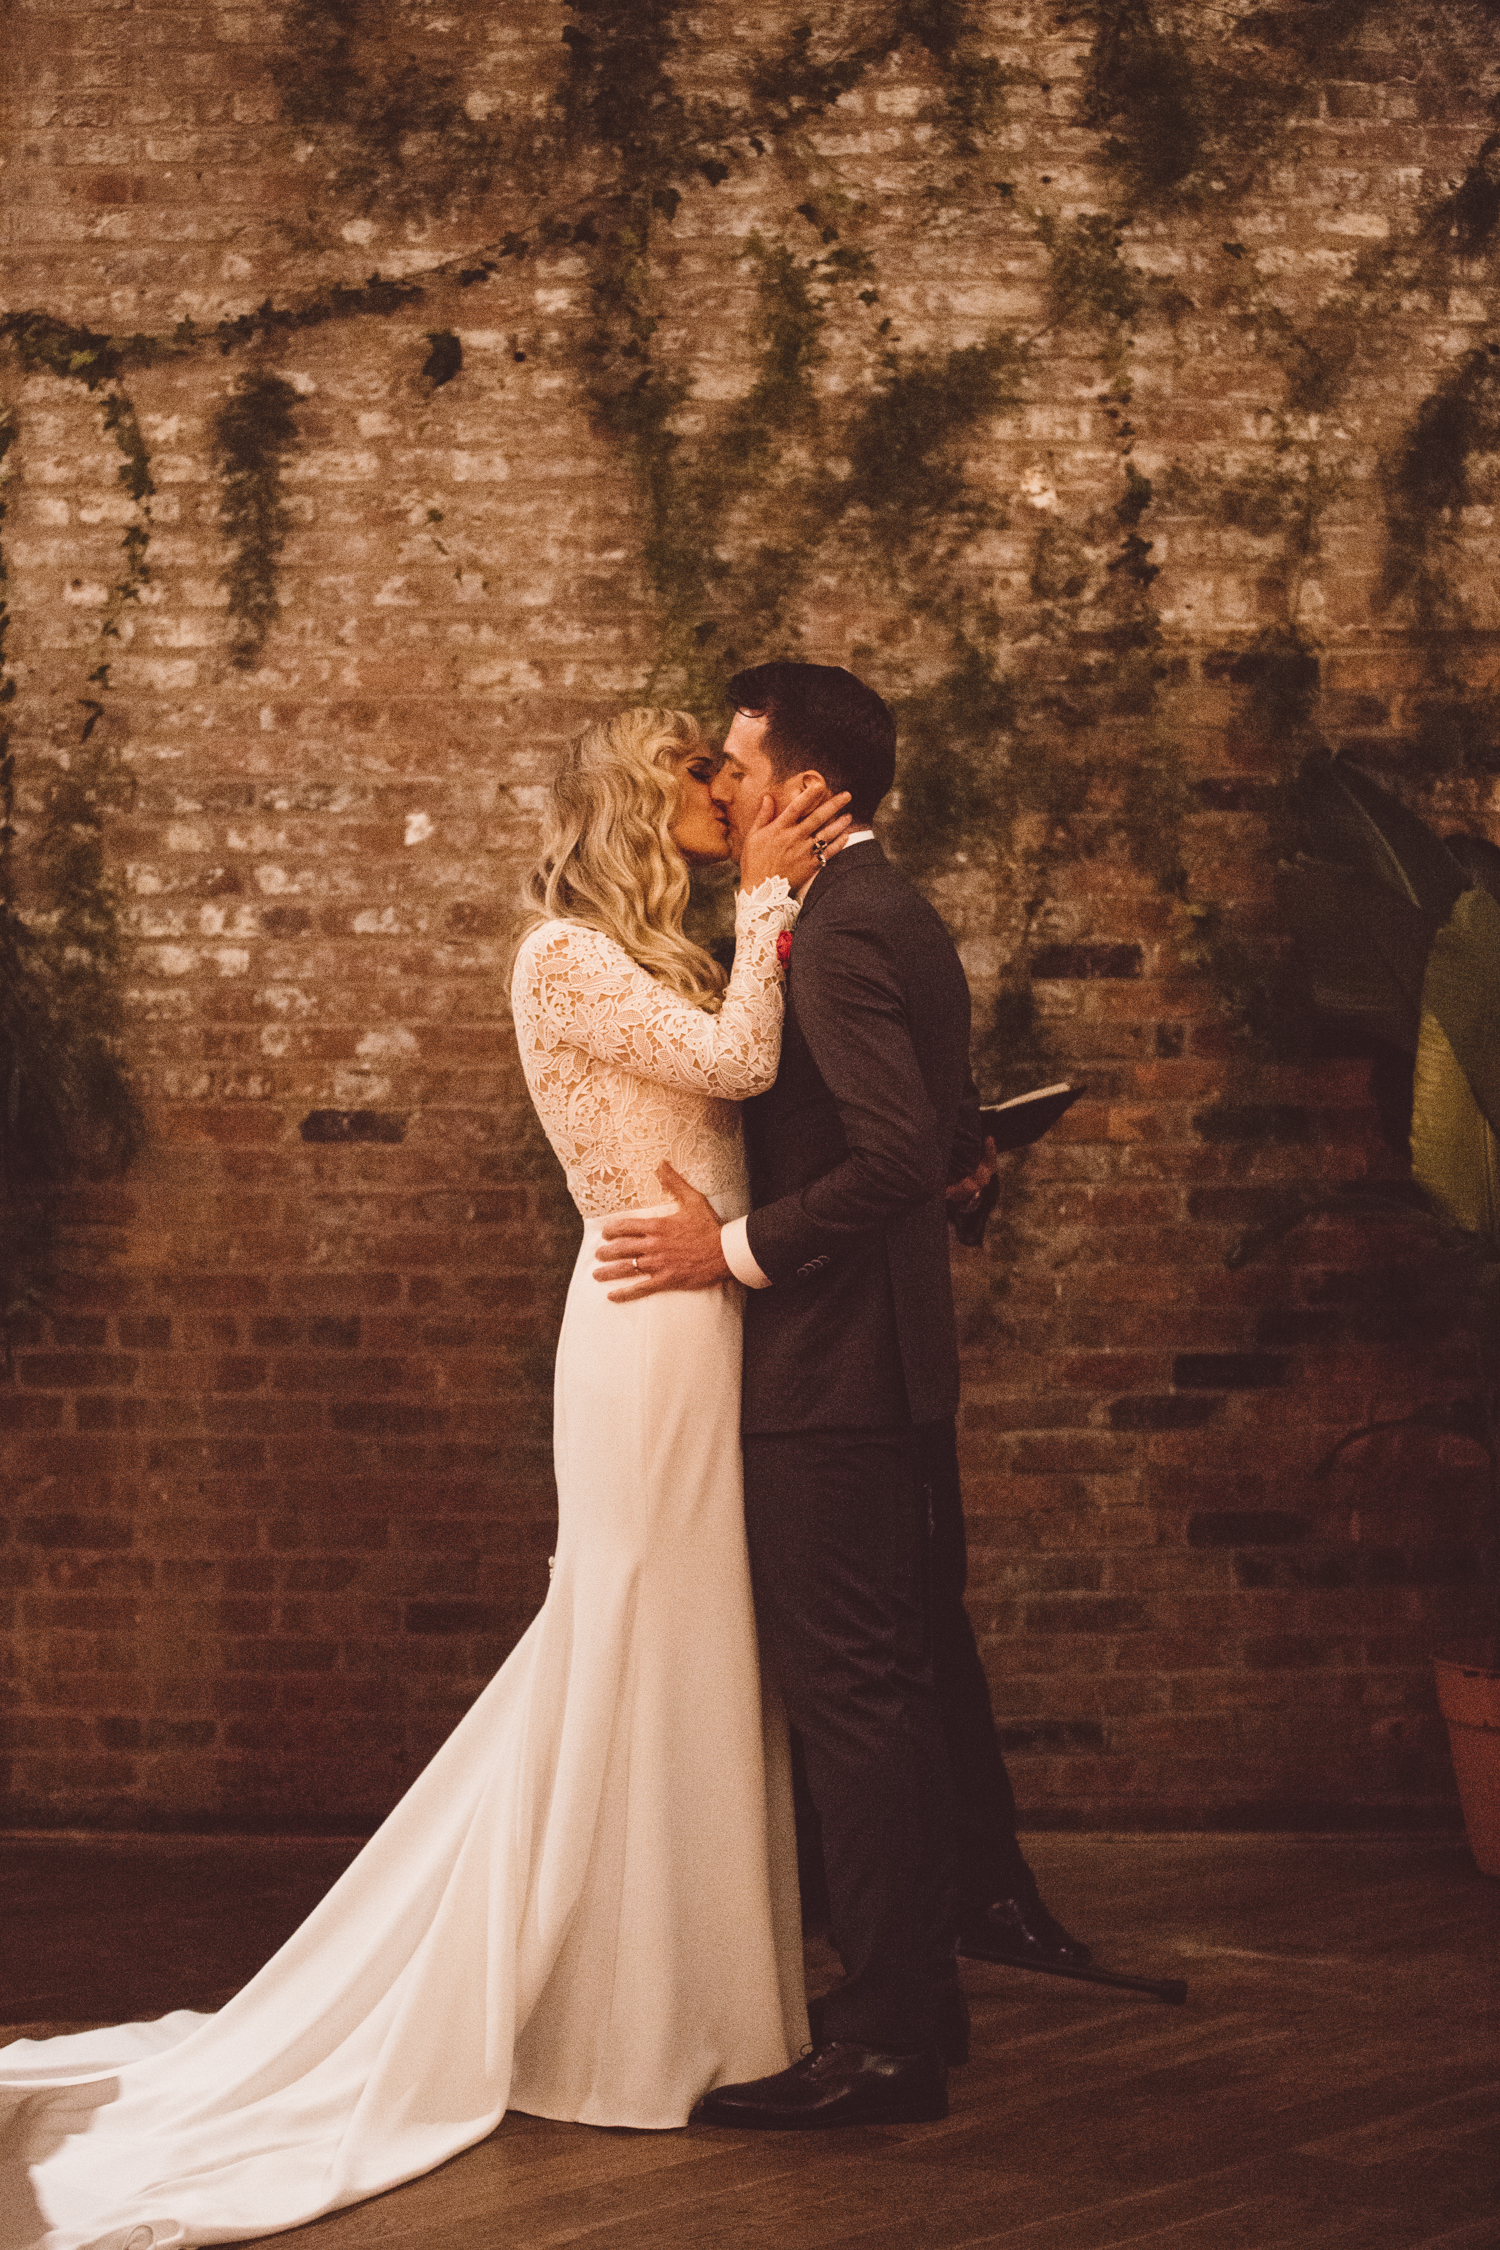 KDP_Andrea&Mike_wedding-604.jpg